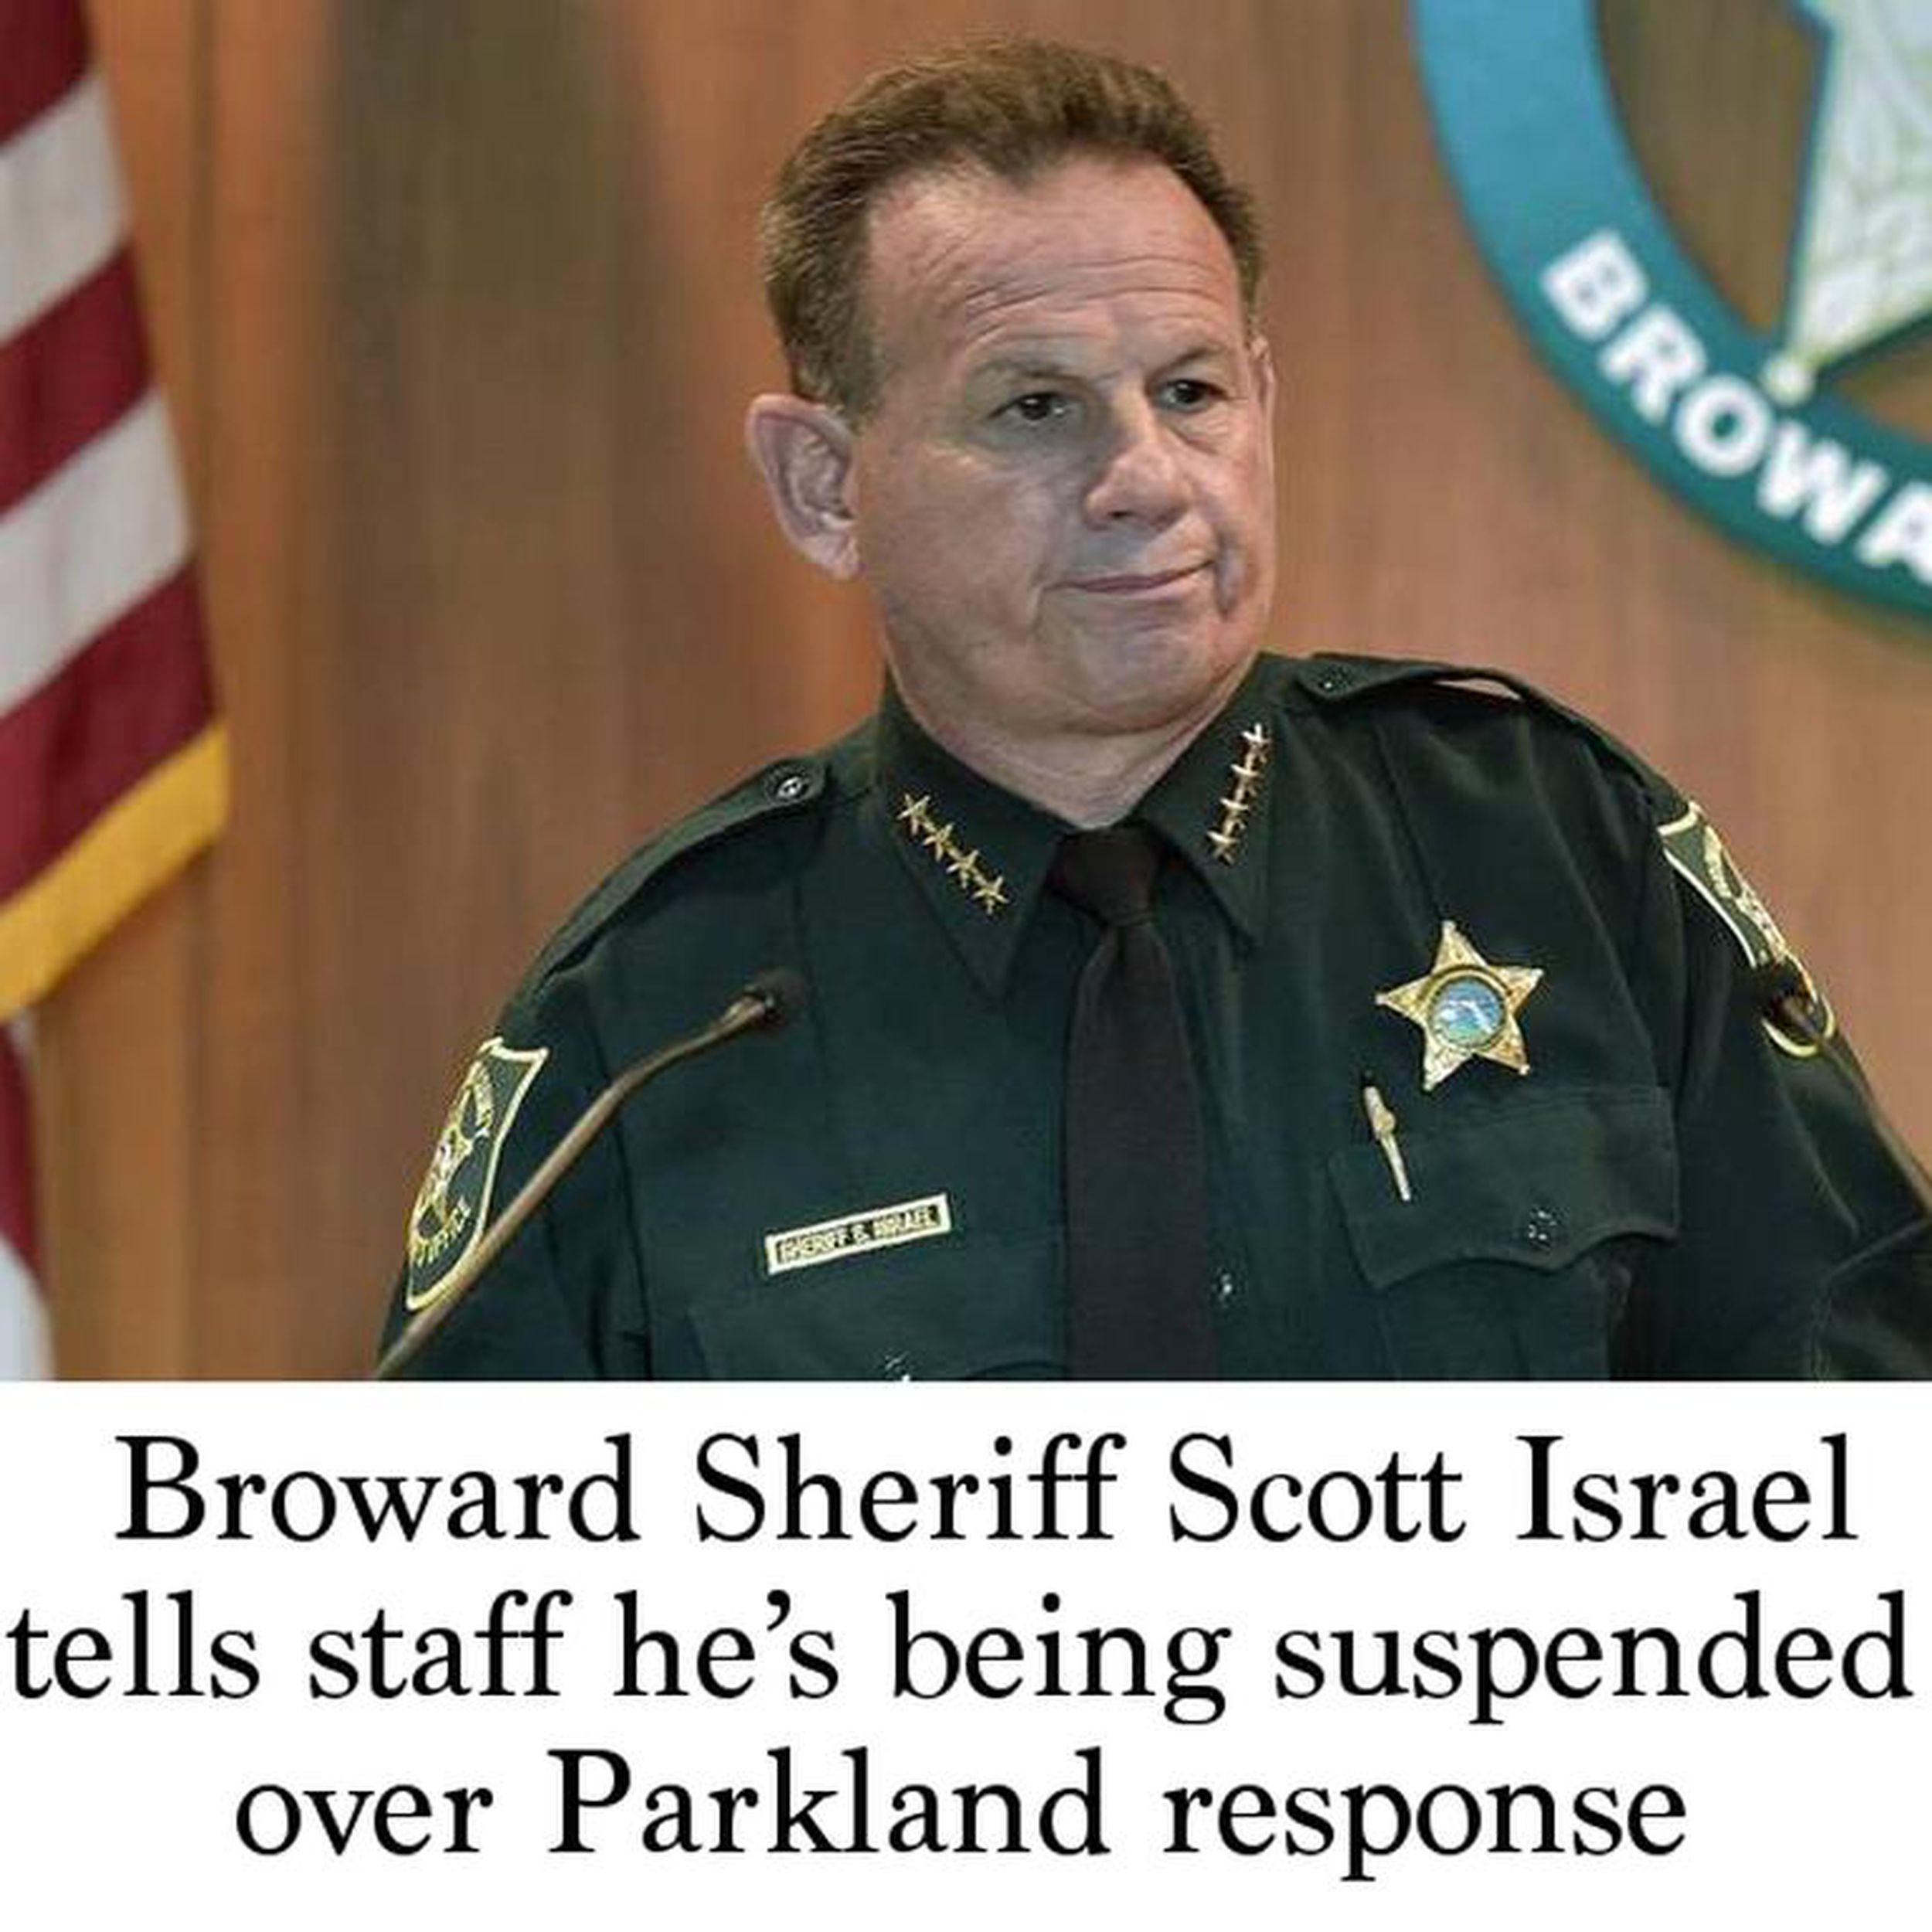 Broward Sheriff Scott Israel tells staff he's being